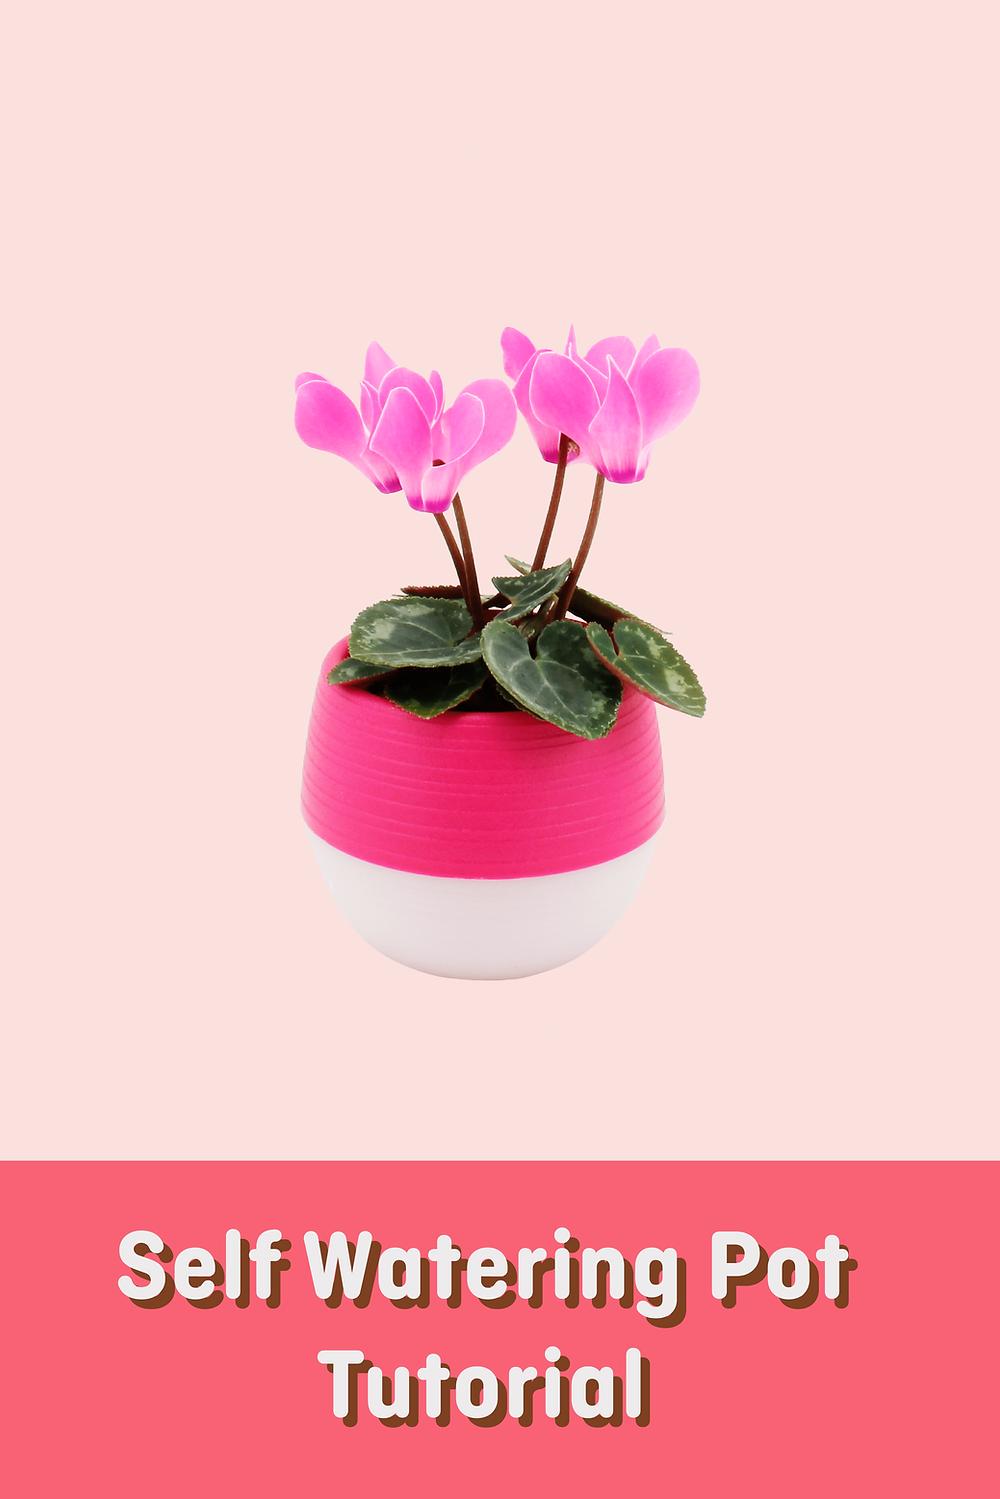 self watering pot tutorial